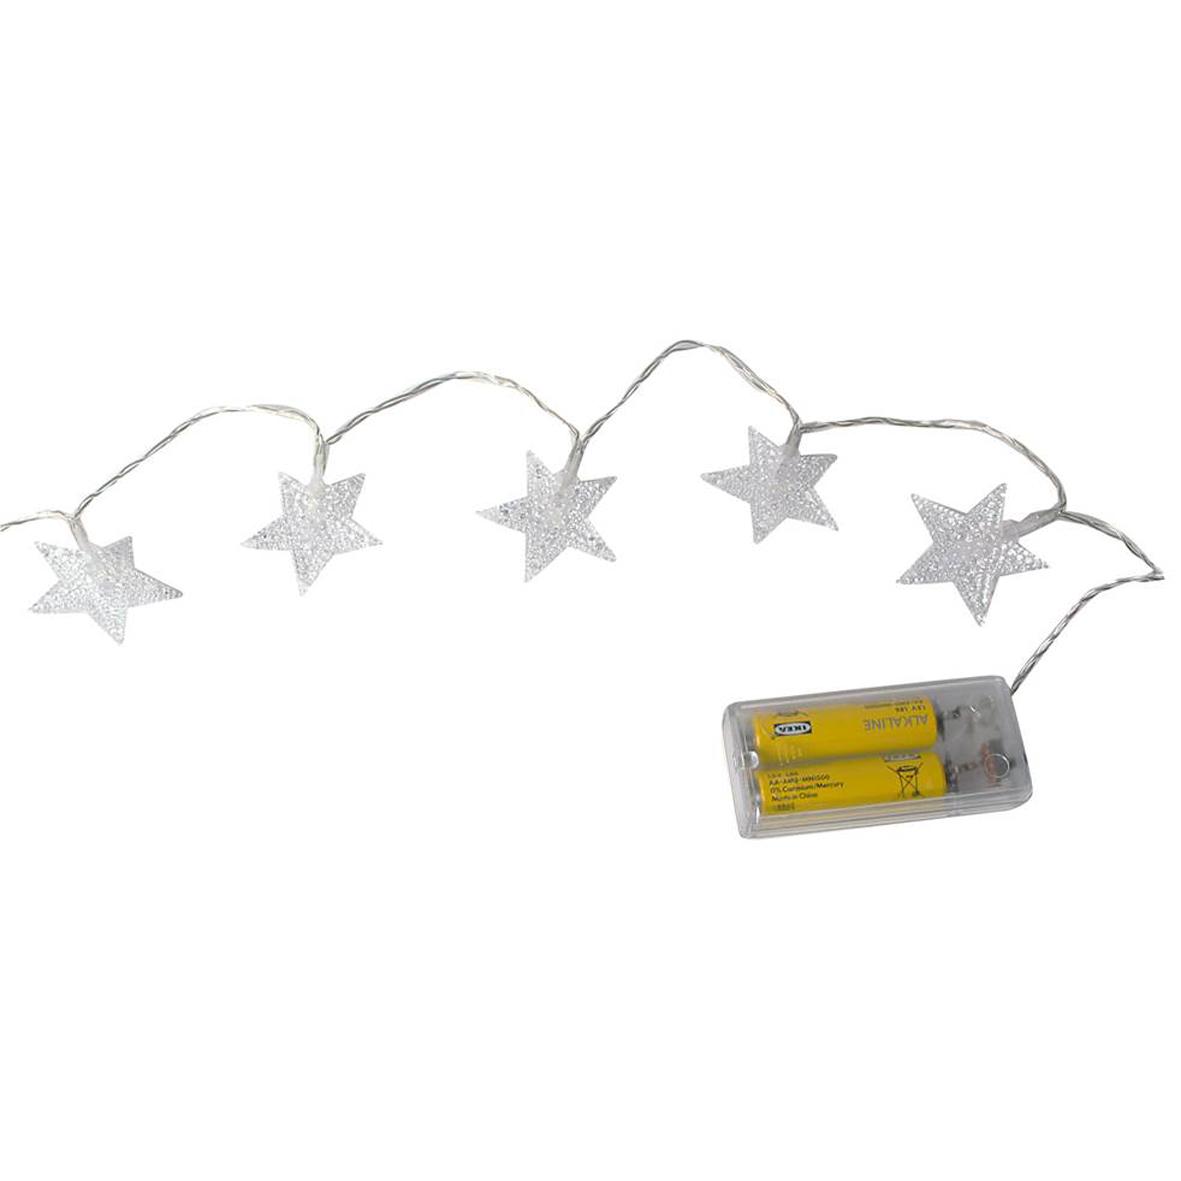 LED Schneeflocke Stern Deko warmweiss erweiterbar